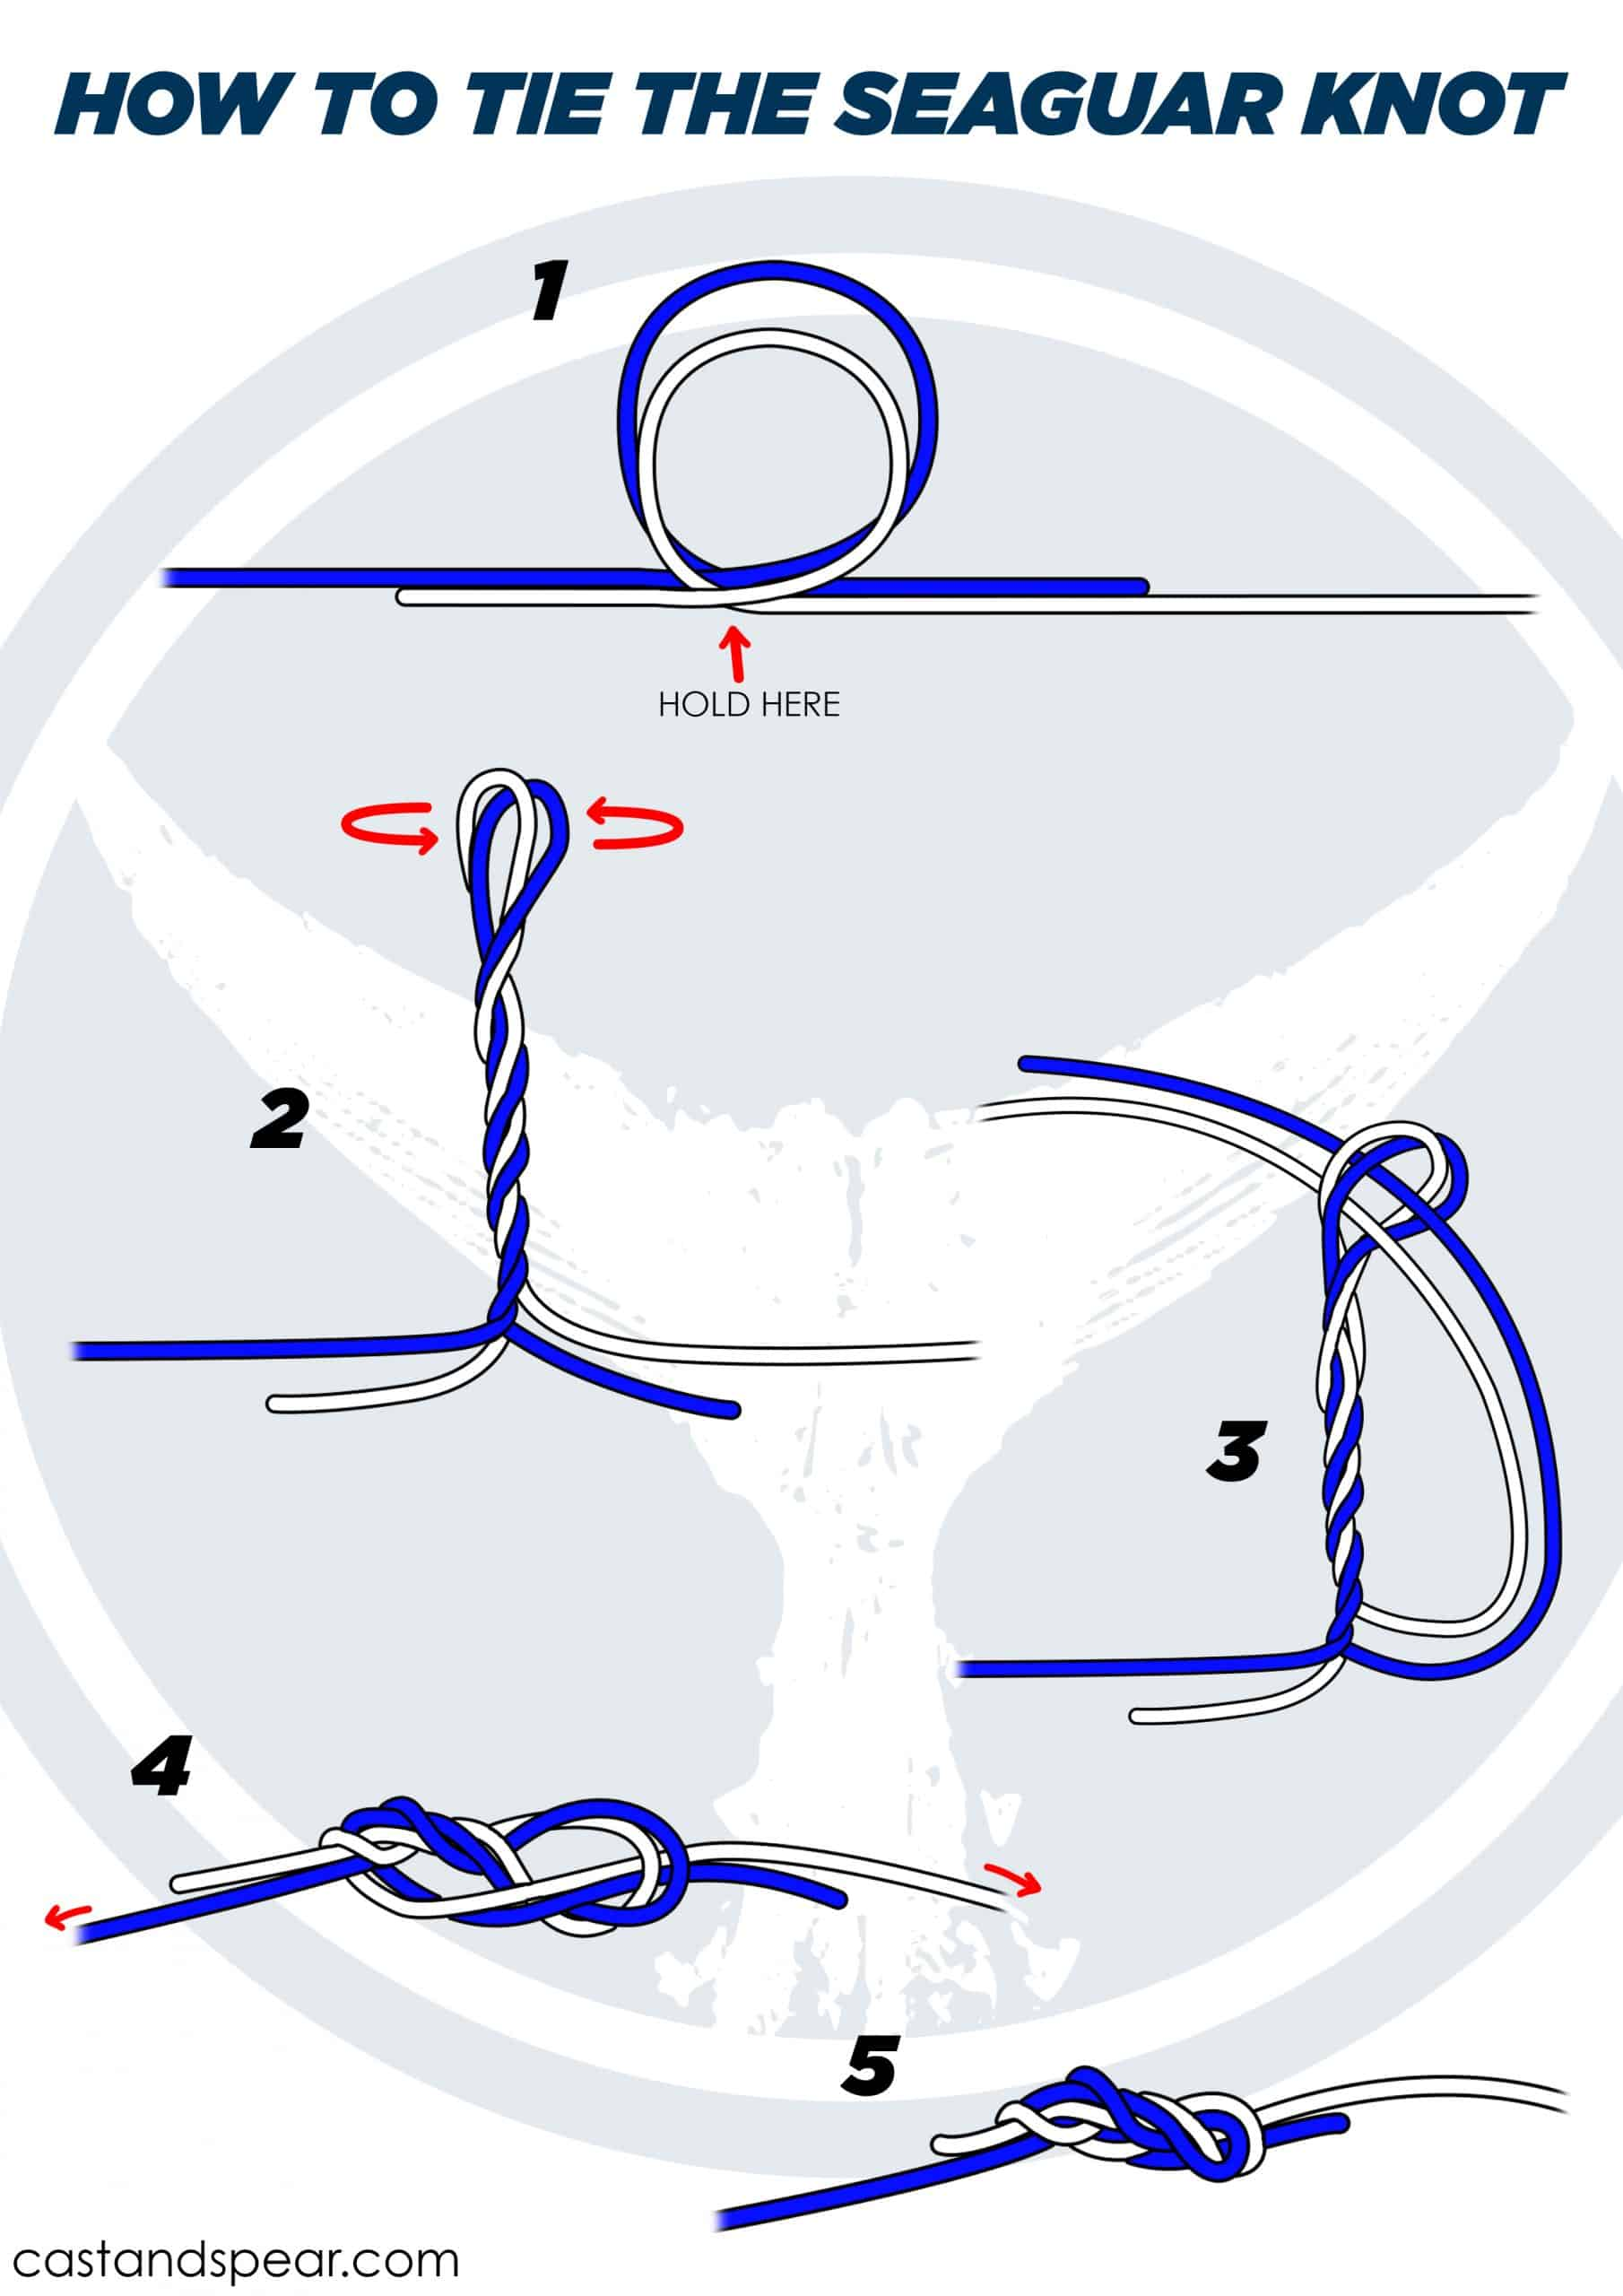 seaguar knot